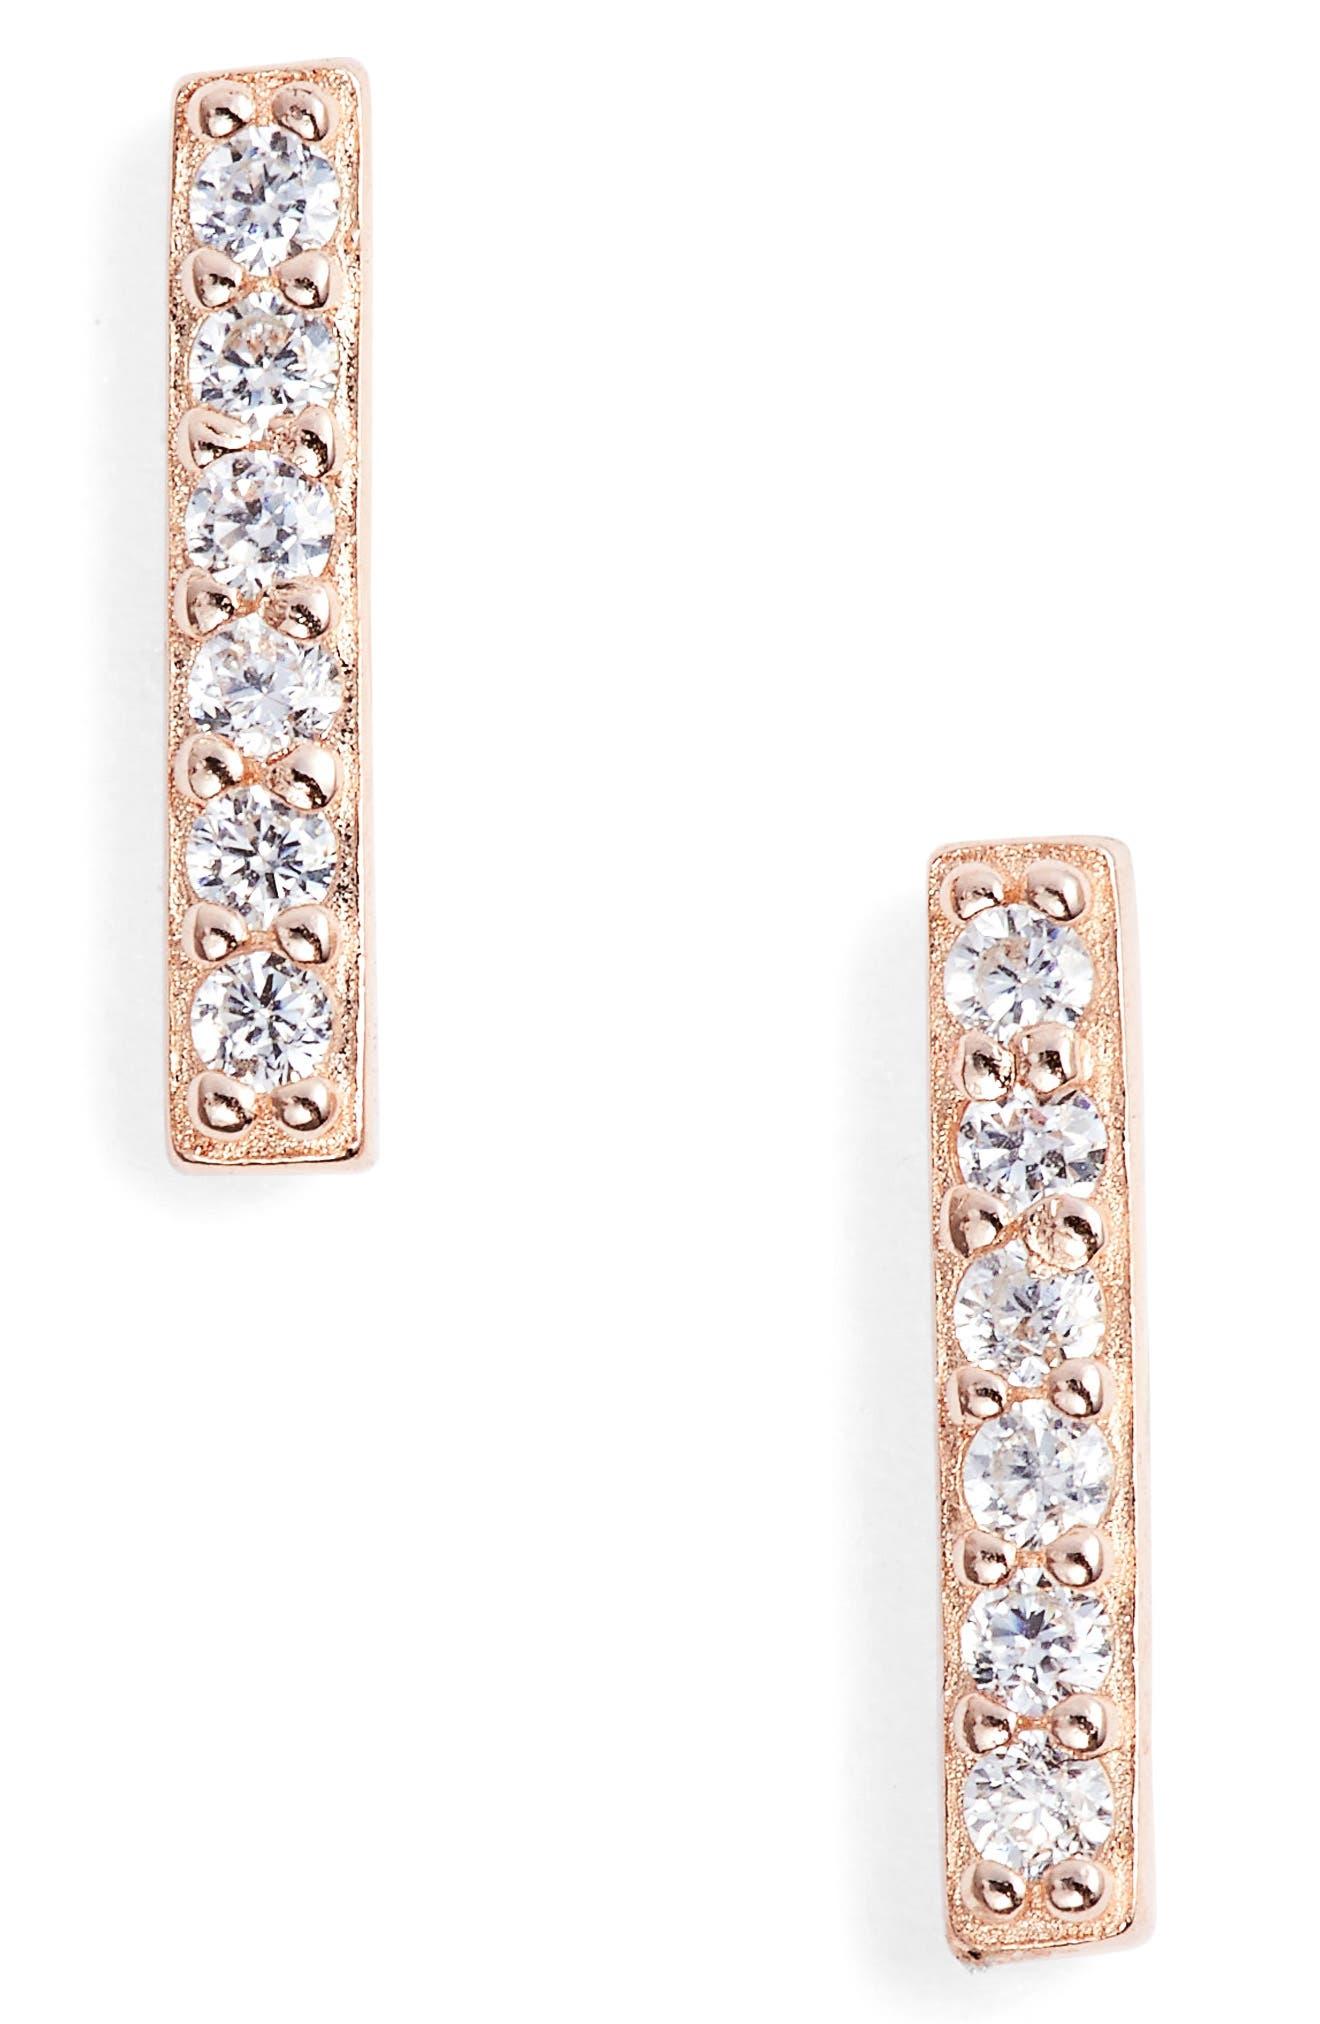 Precious Metal Plated Cubic Zirconia Bar Earrings,                             Main thumbnail 1, color,                             Rose Gold